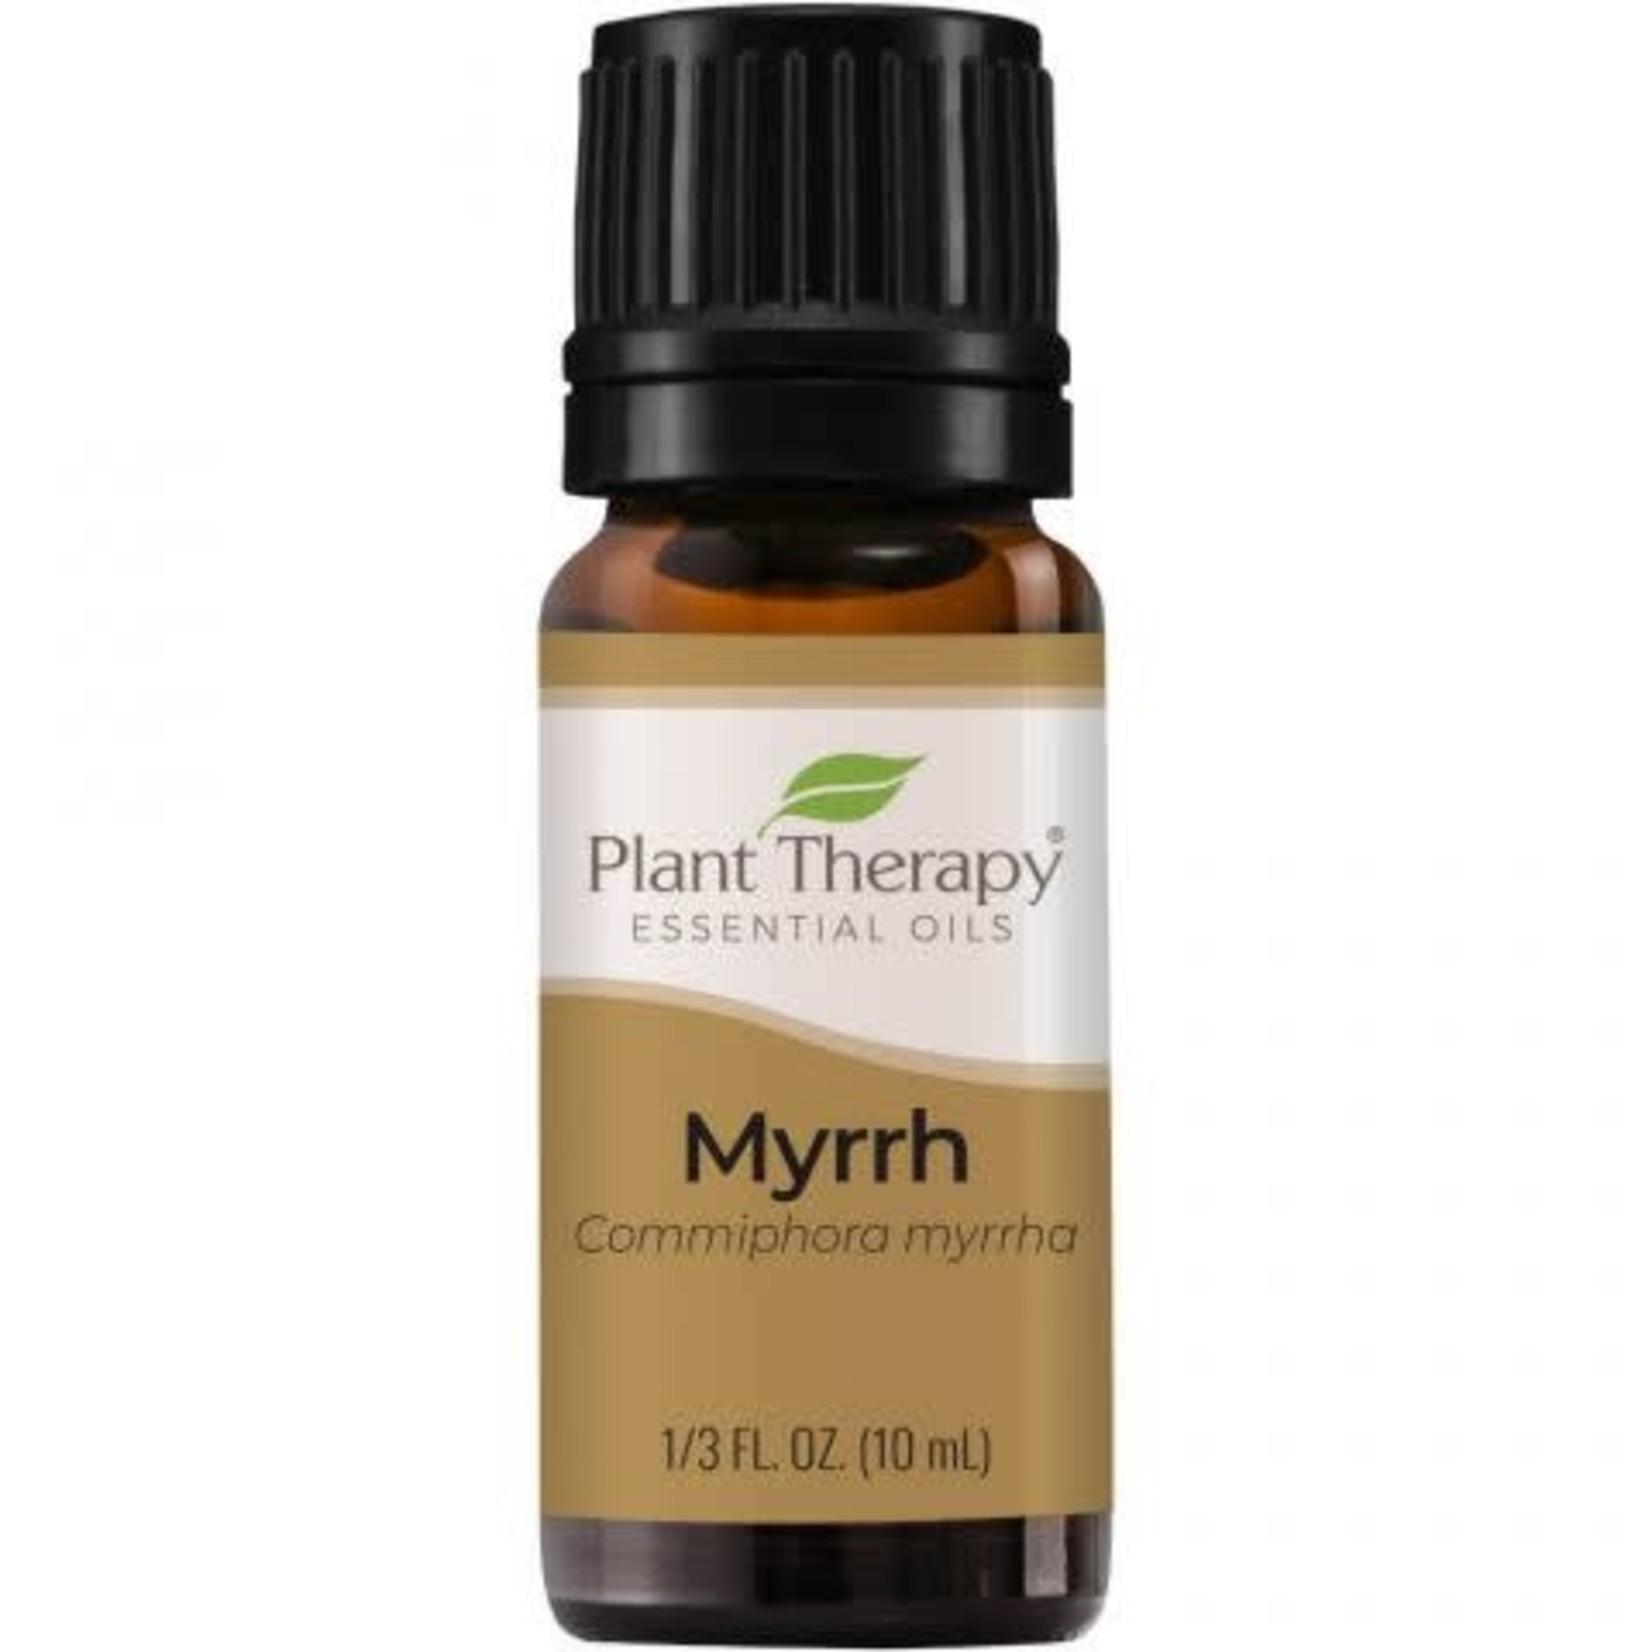 Plant Therapy PT Myrrh Essential Oil 10ml